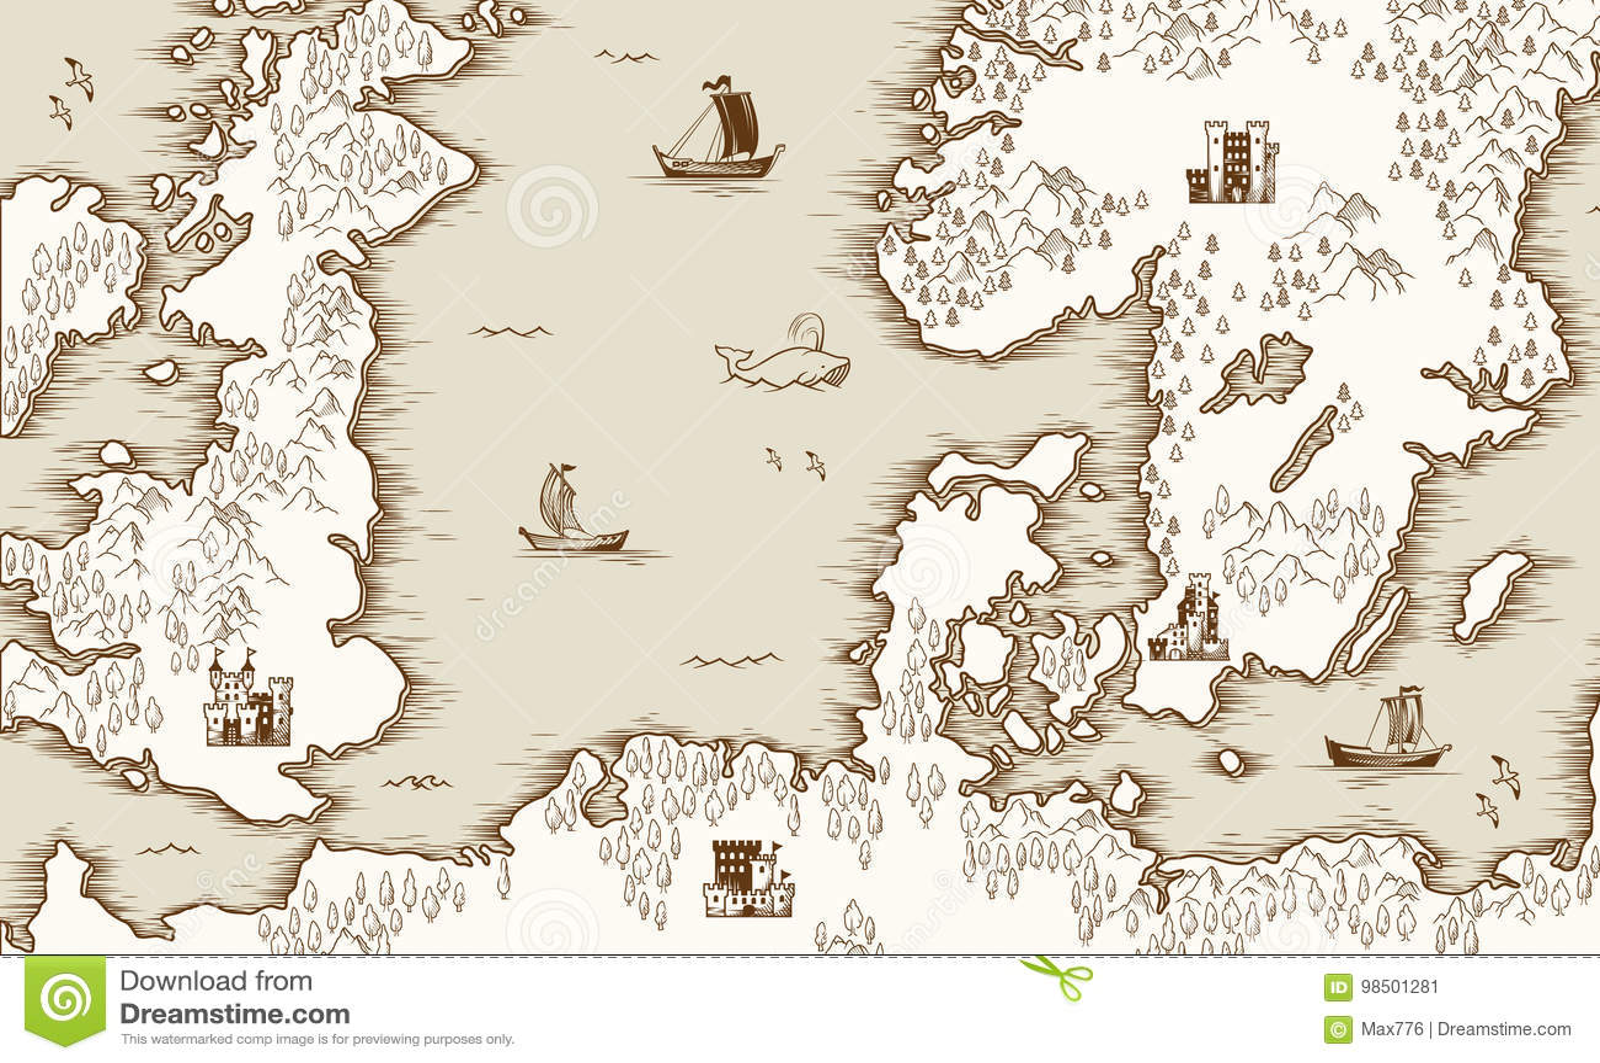 1cbf0179bb619 Vieille Carte De La Mer Du Nord, De La Grande-Bretagne Et De La ...